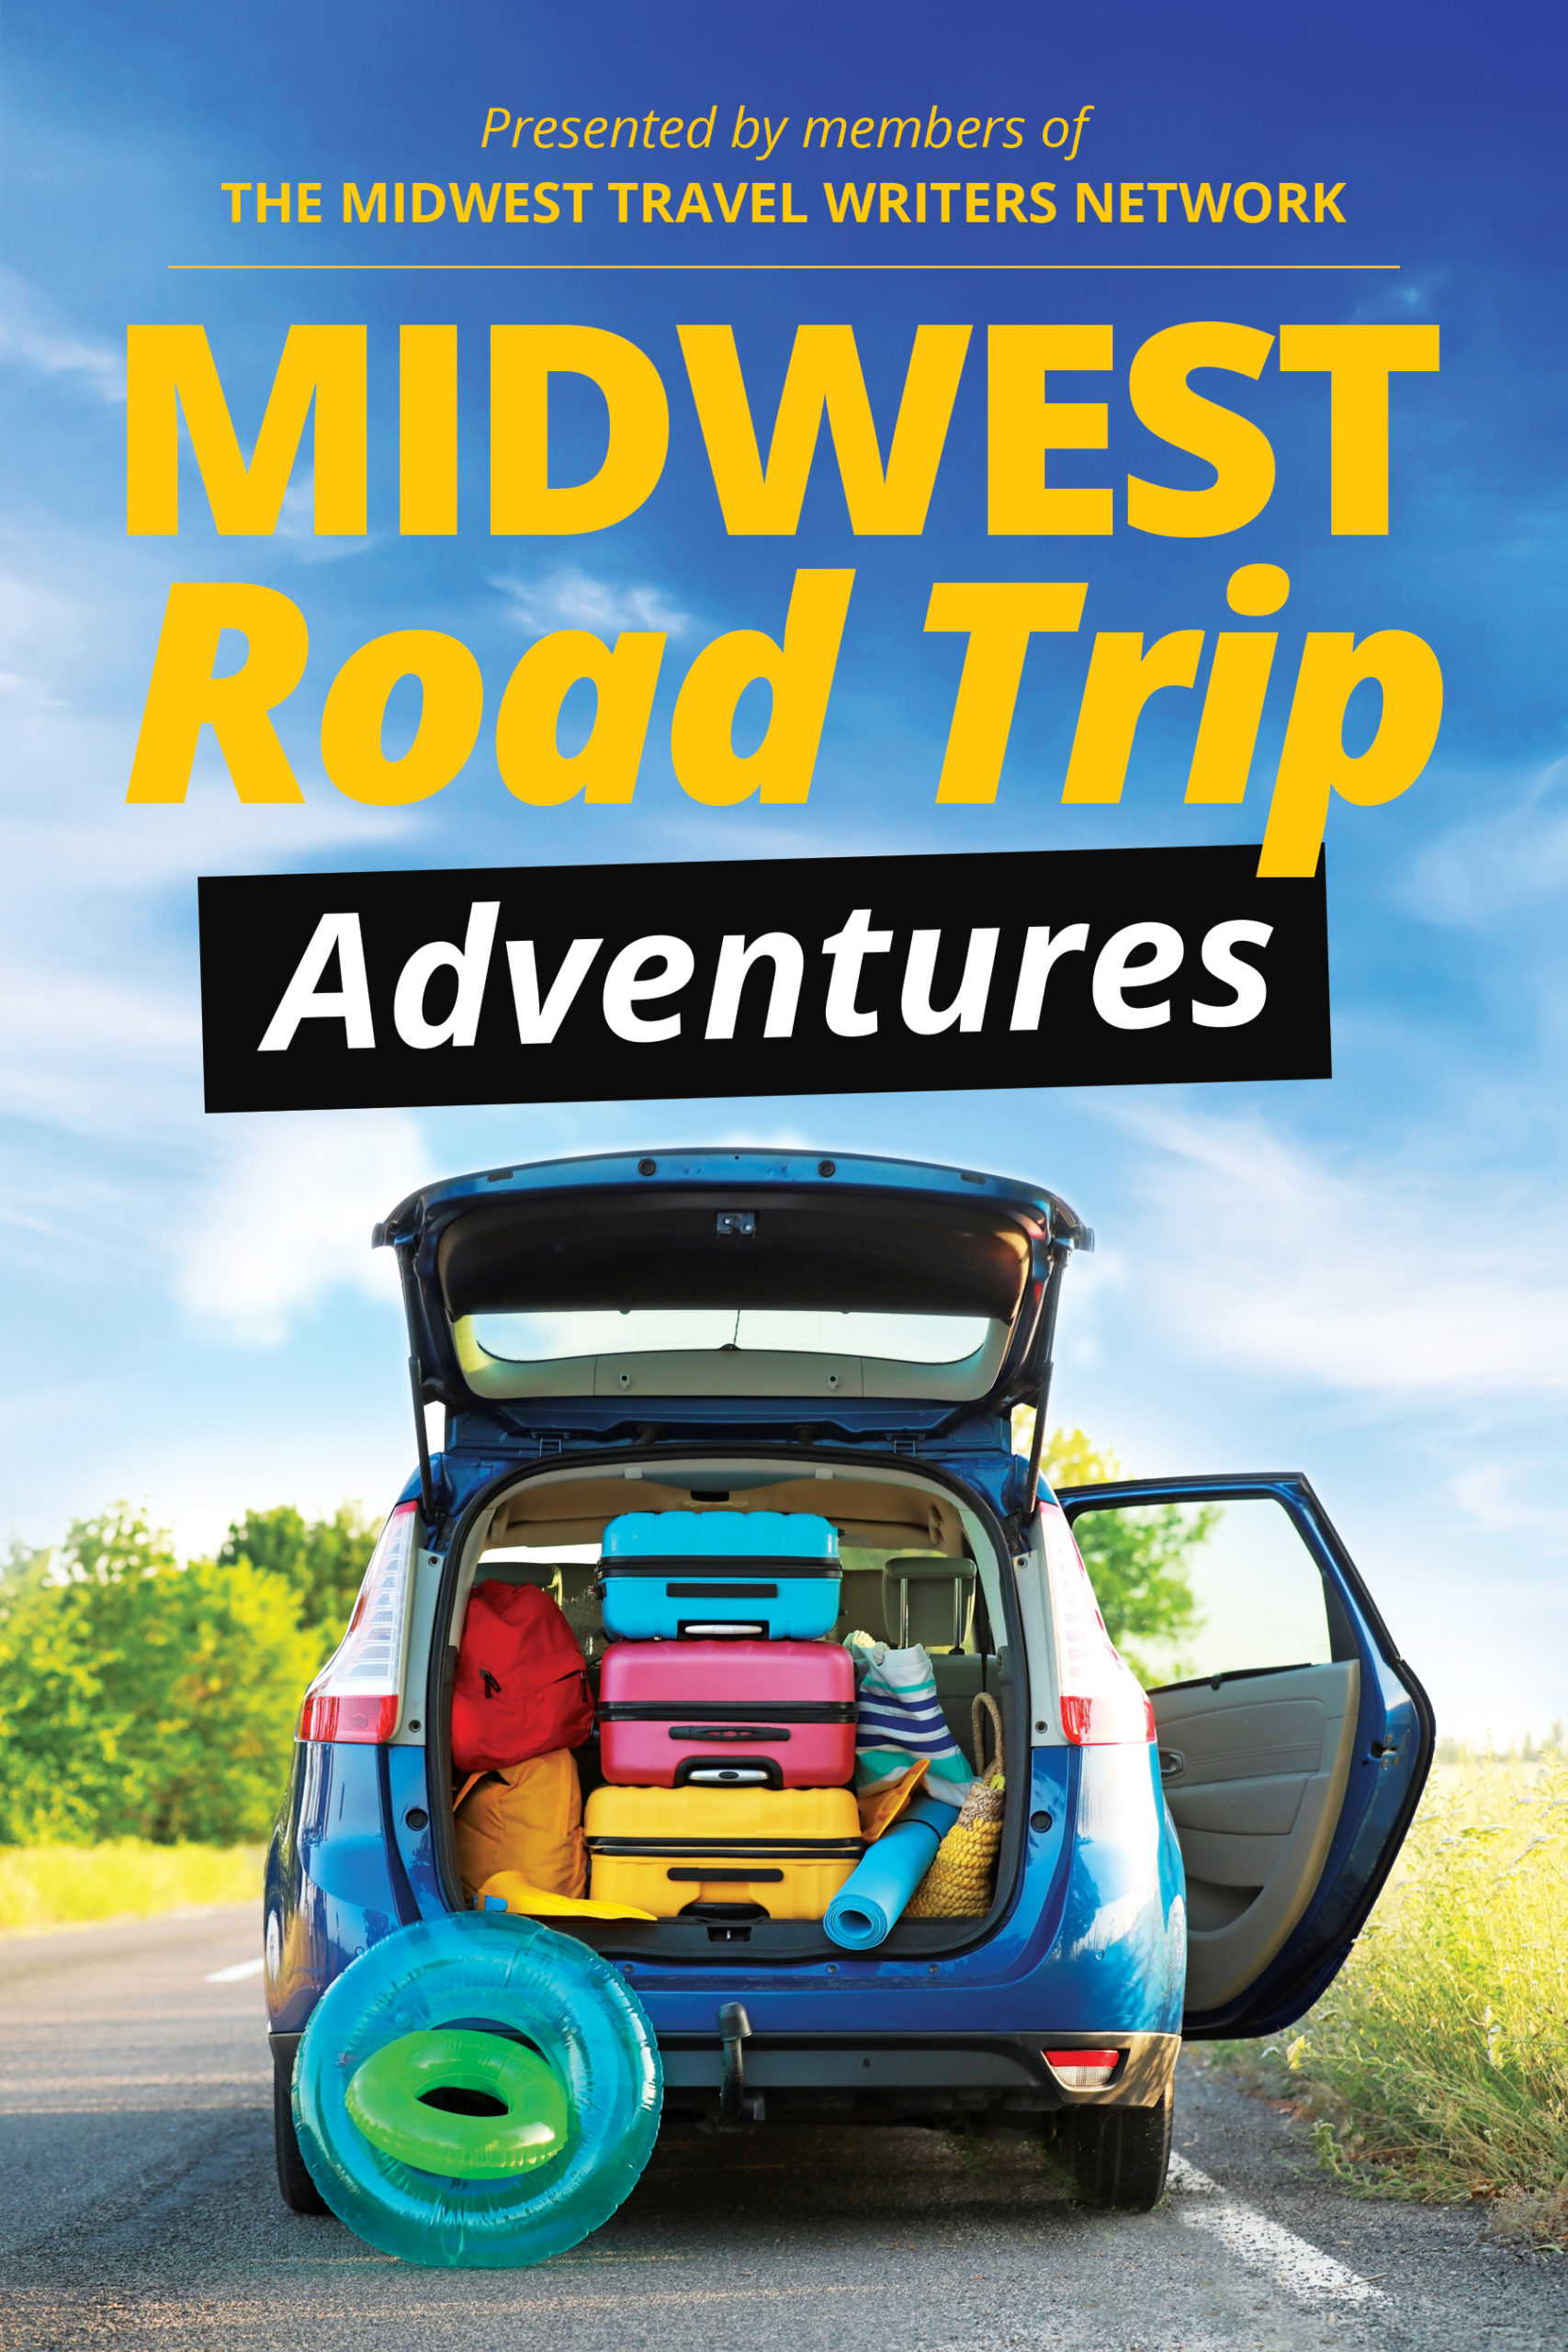 Midwest Road Trip Adventures